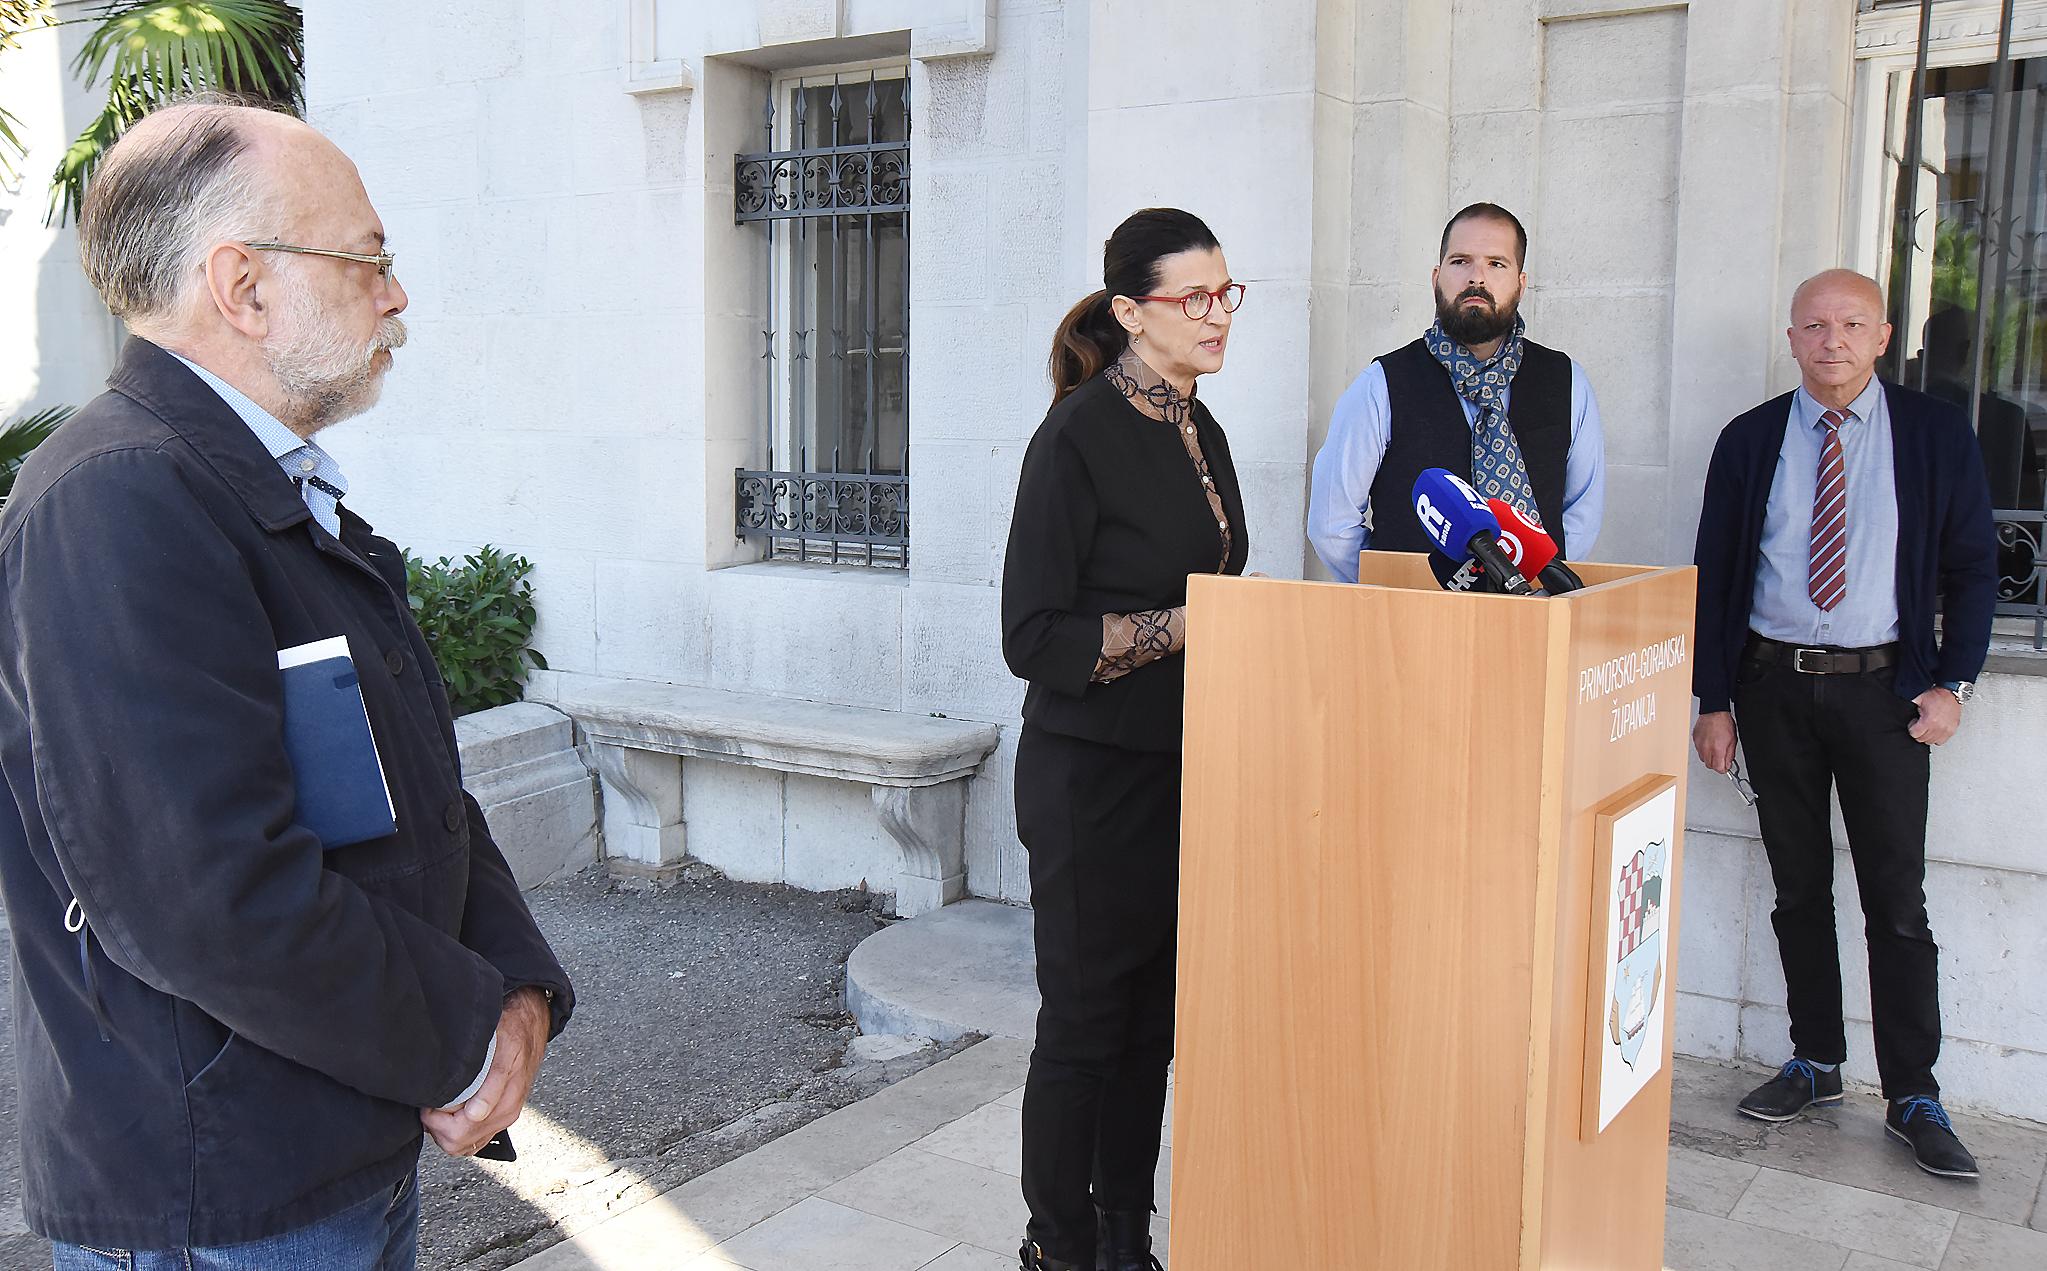 Struka je protiv - Leonardo Bressan, Romana Jerković, Vojko Braut i Vladimir Mićović / Foto S. DRECHSLER